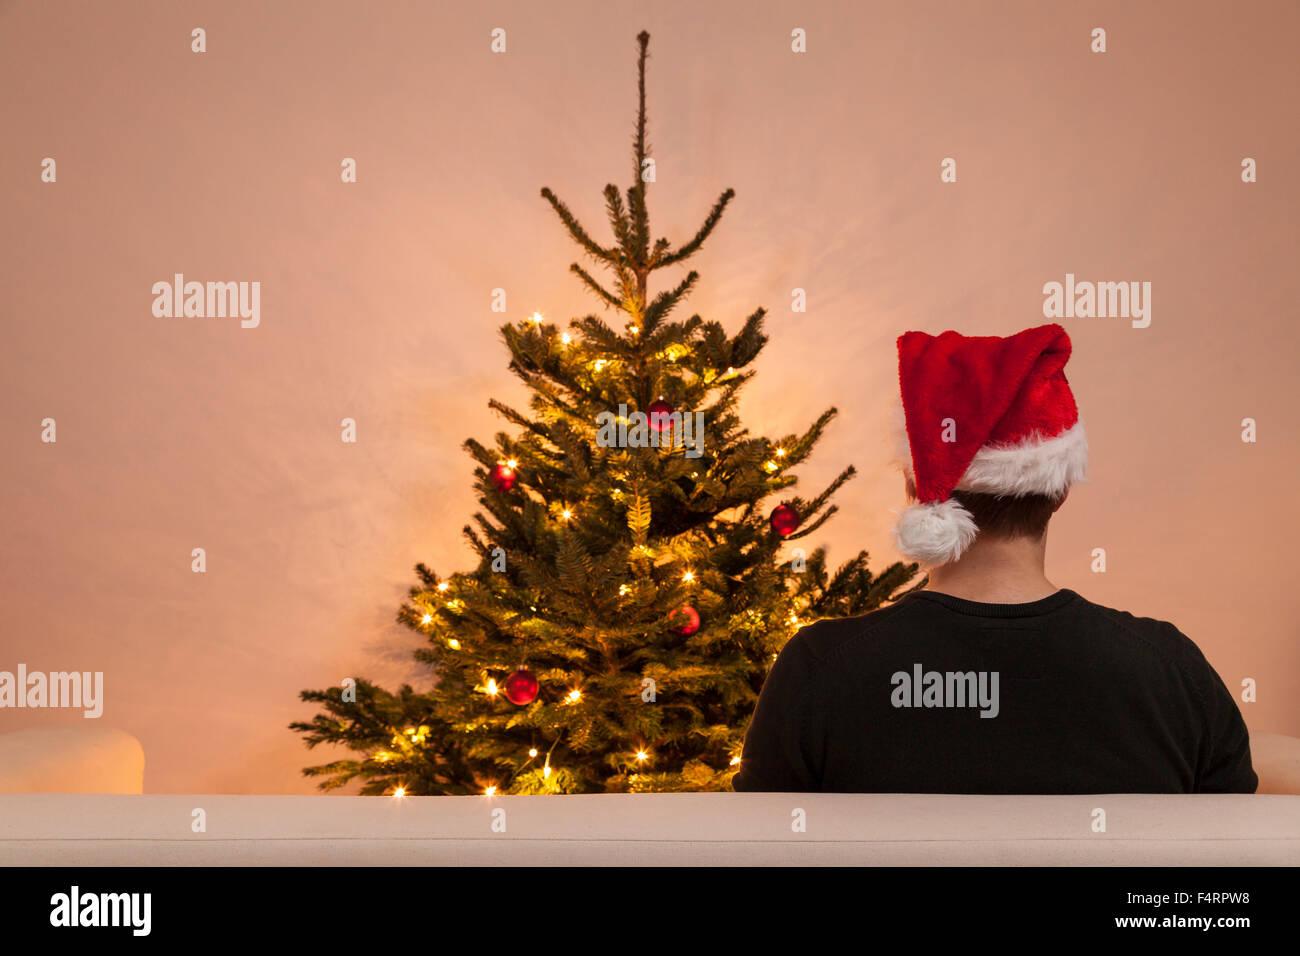 single man alone on christmas eve - Stock Image